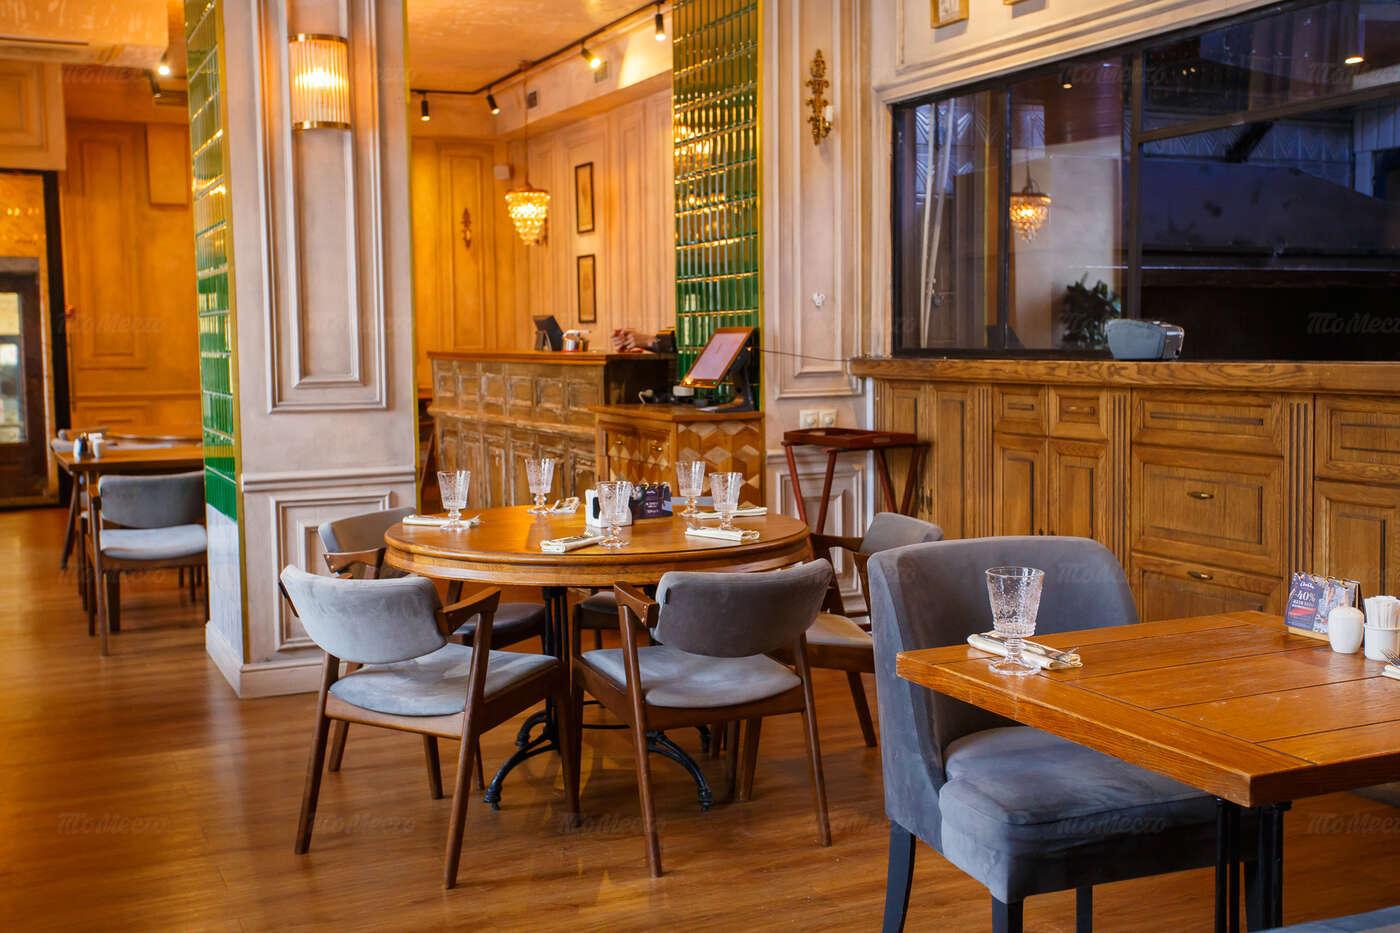 Ресторан Чача на набережной канала Грибоедова фото 11